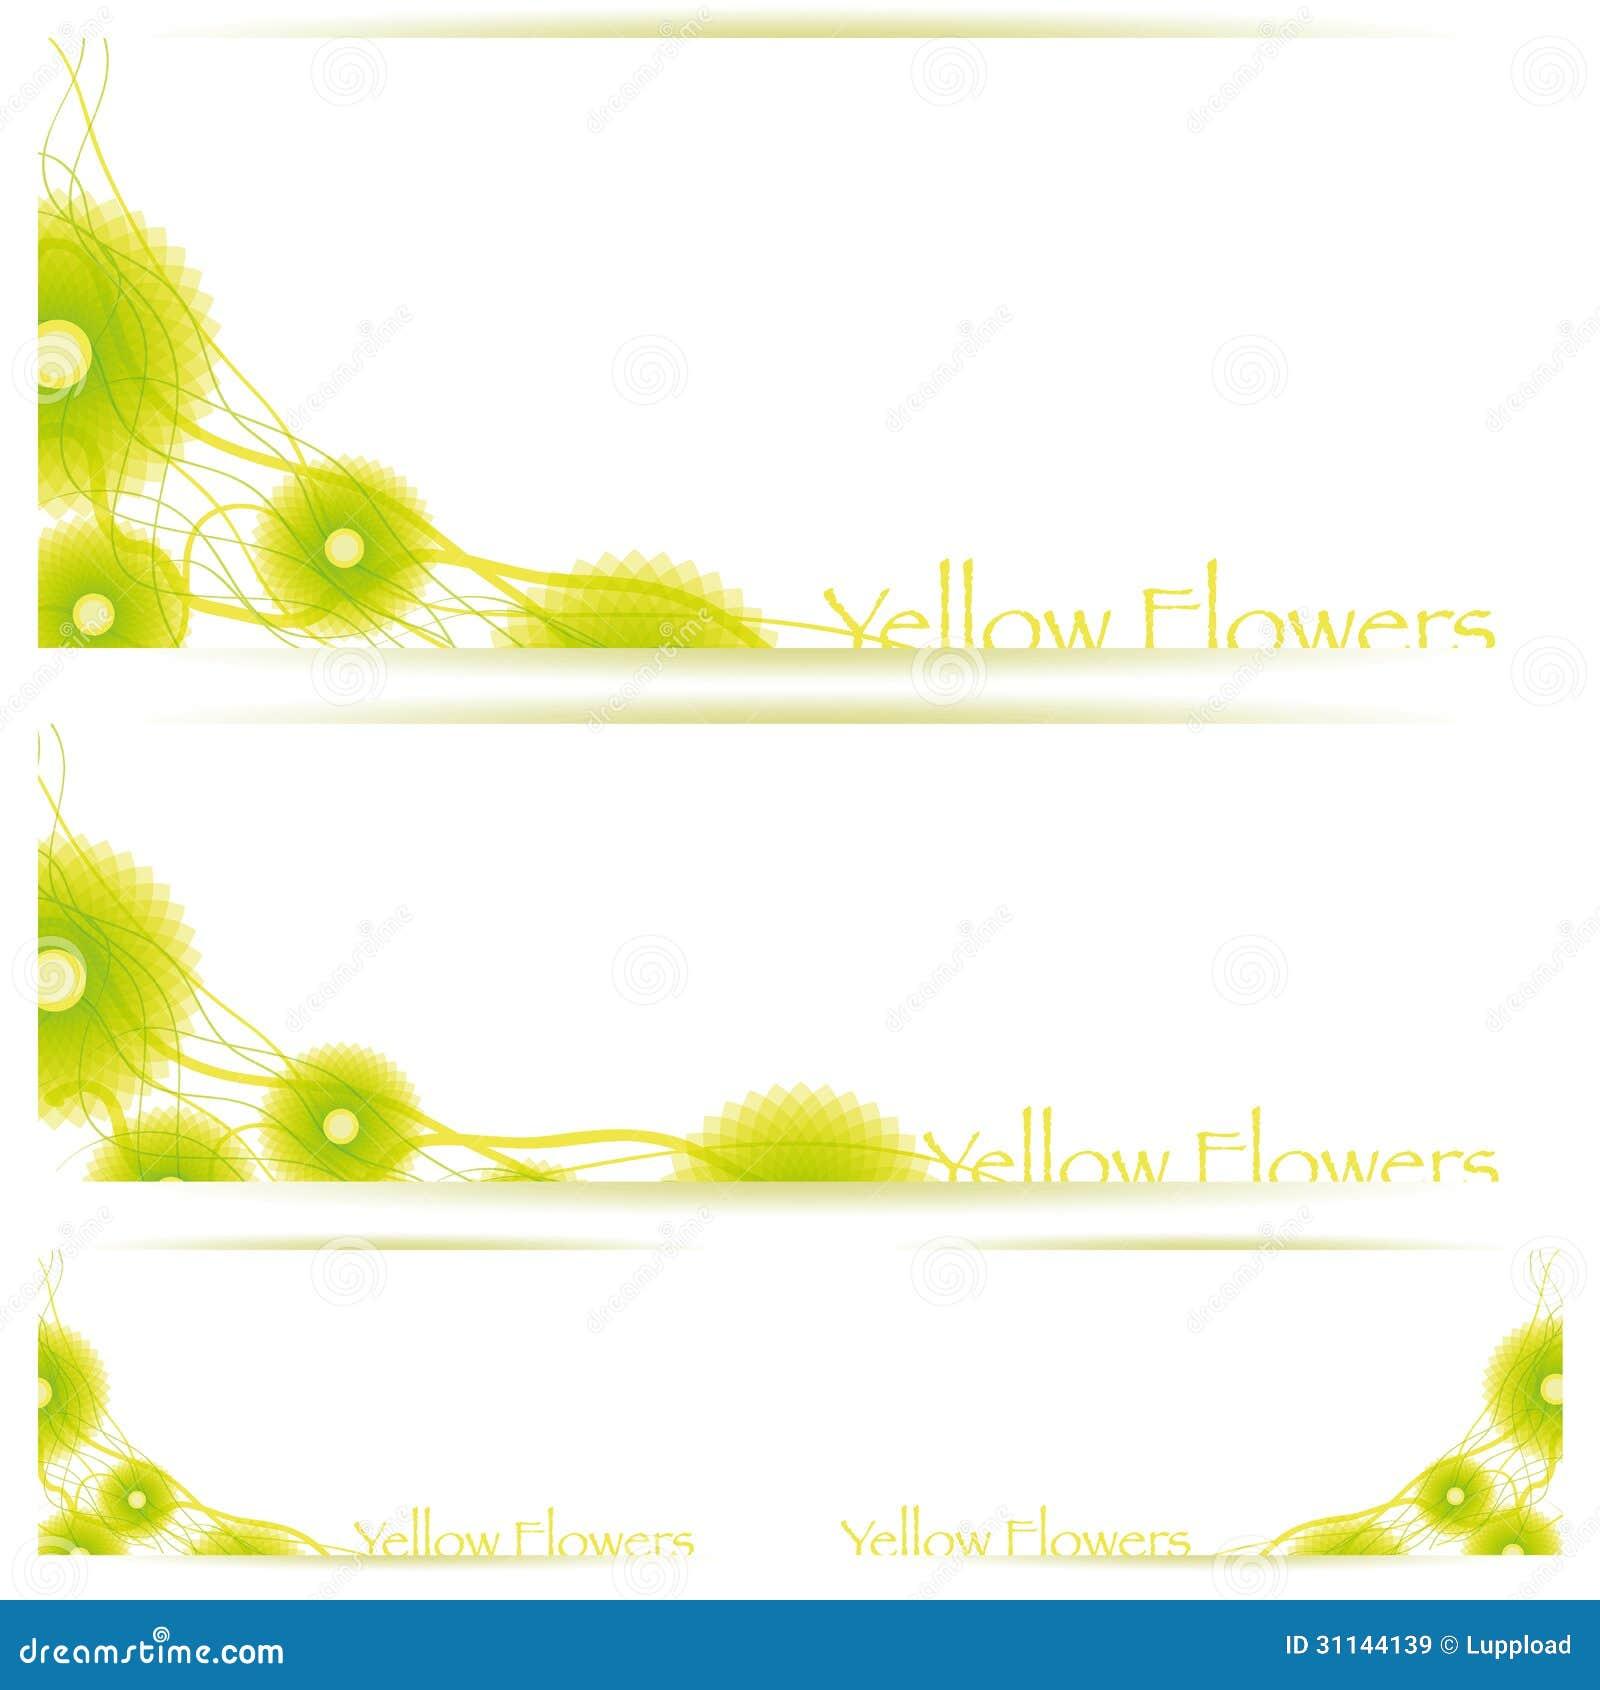 Flower vector background brochure template royalty free for Brochure background templates